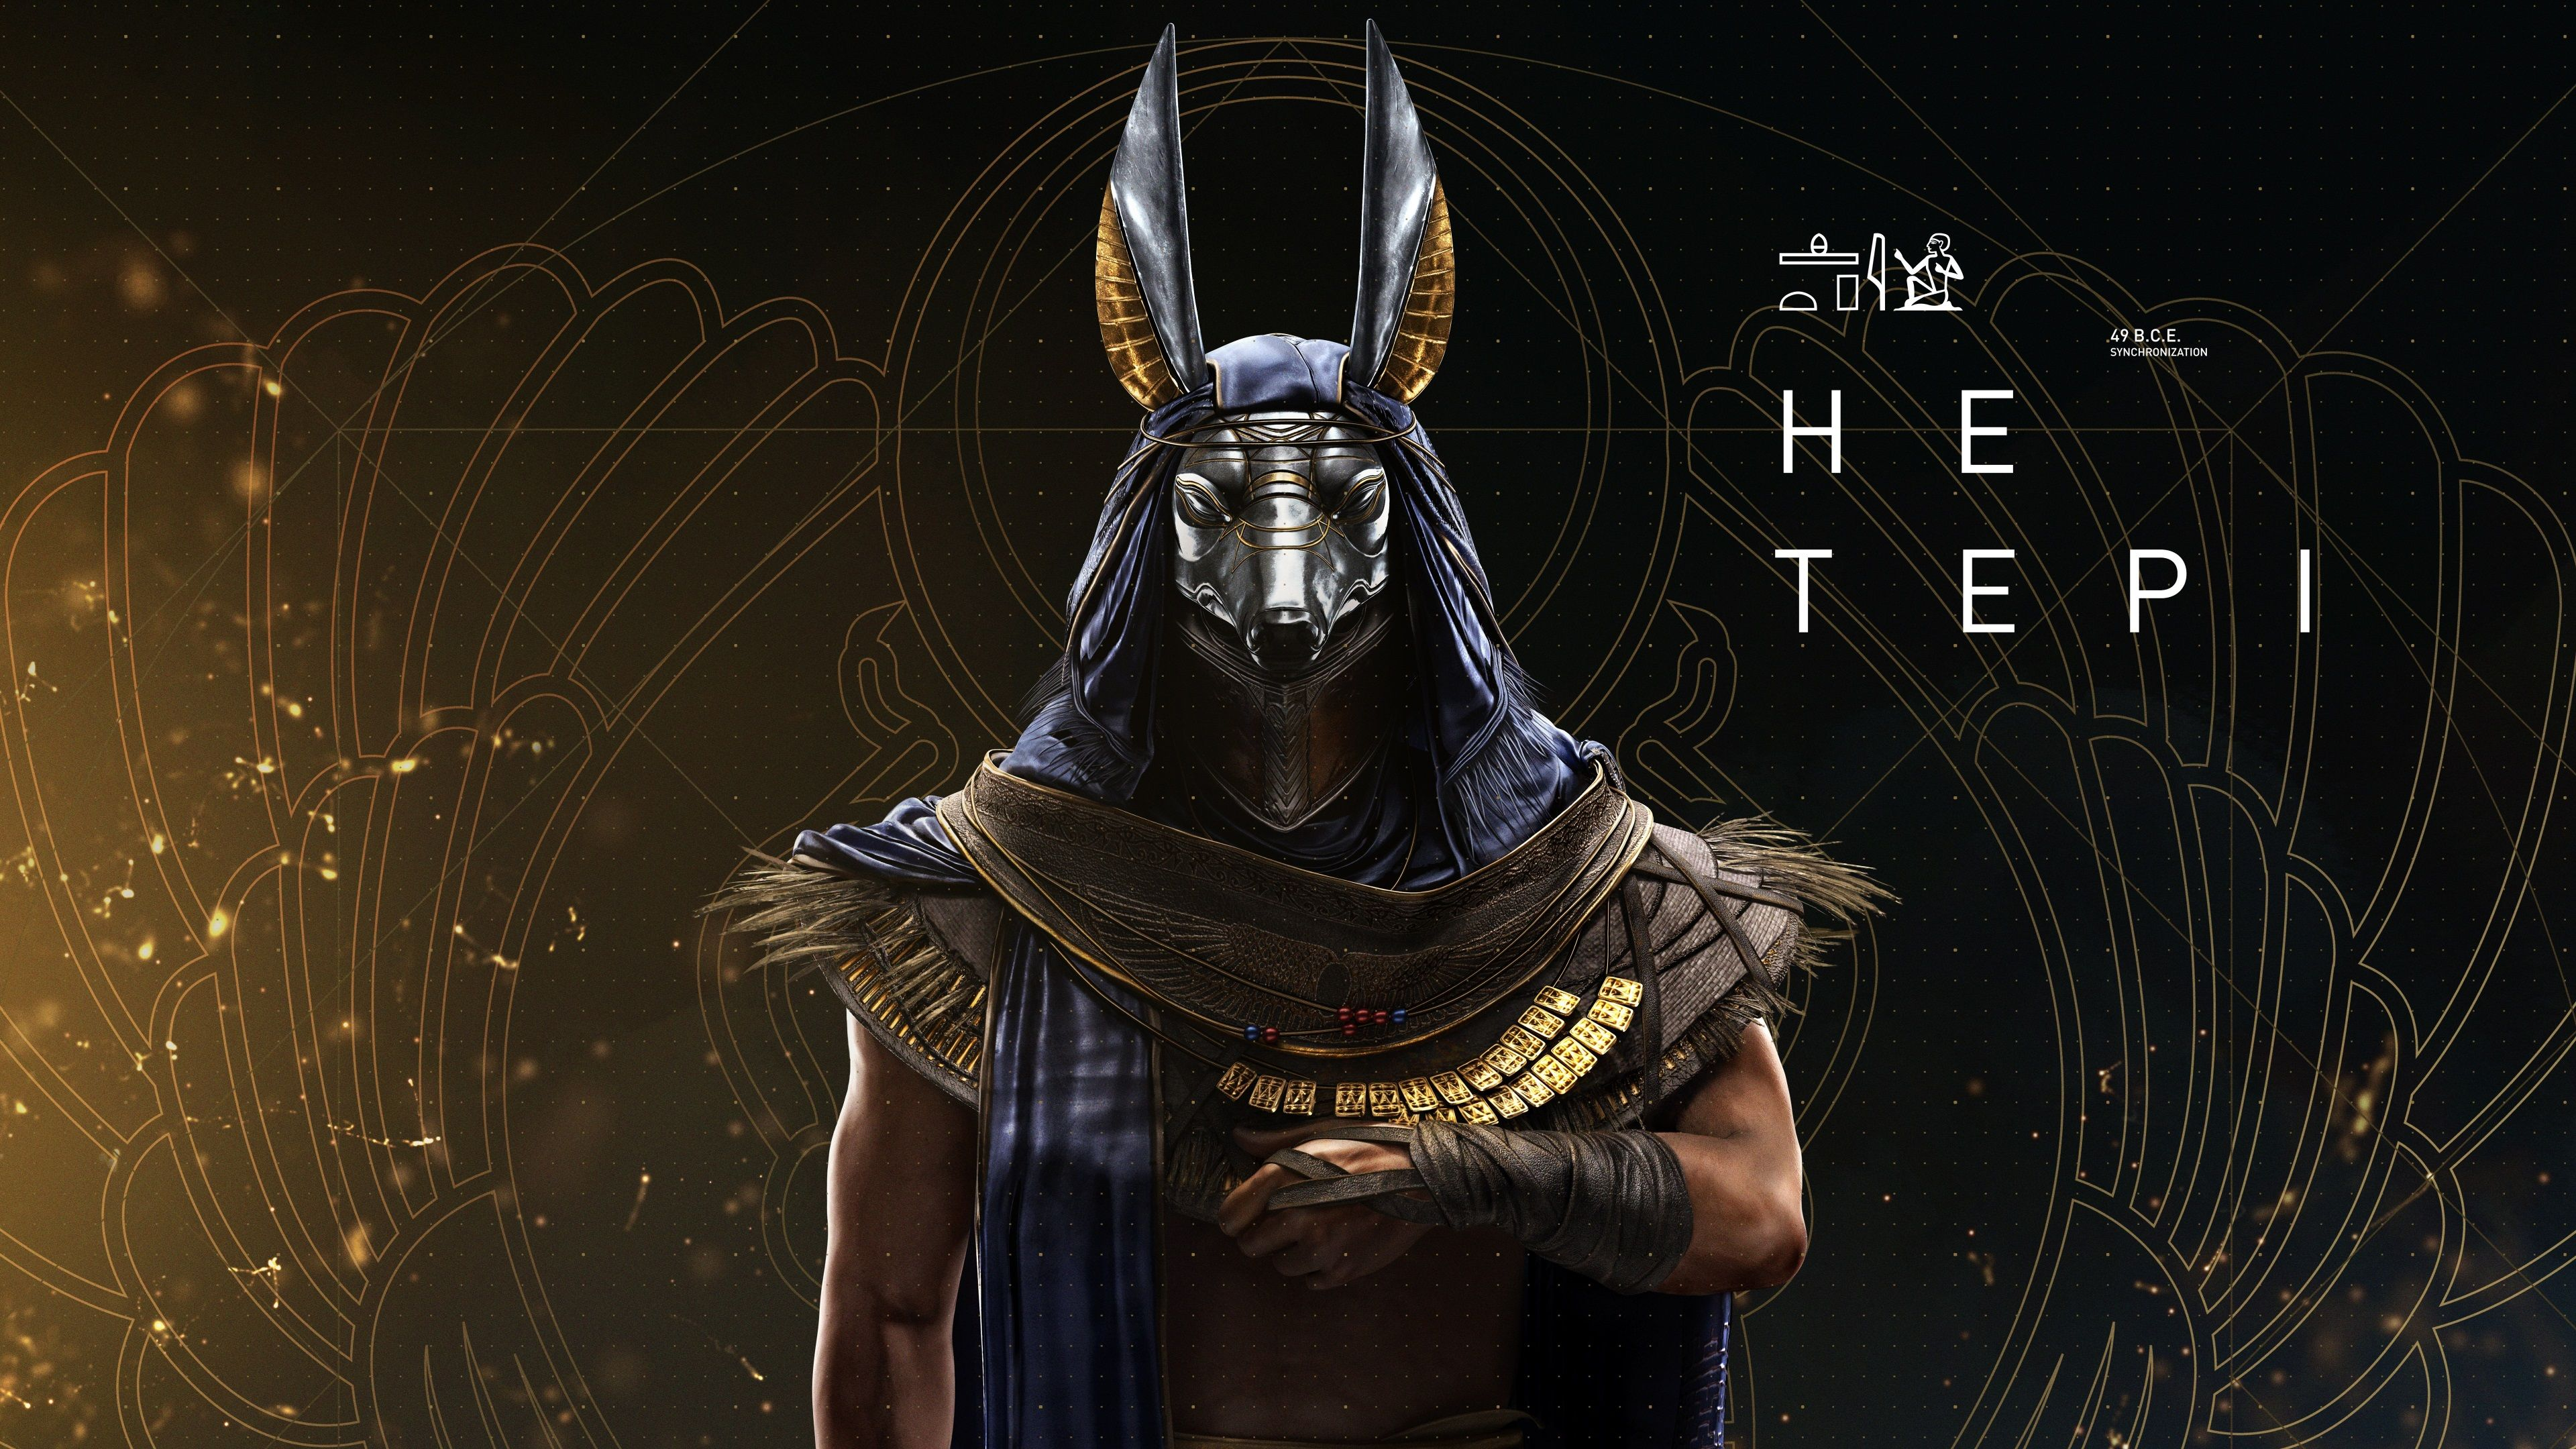 3840x2160 Hetepi 4k Pictures For Computer Anubis Assassins Creed Assassins Creed Origins